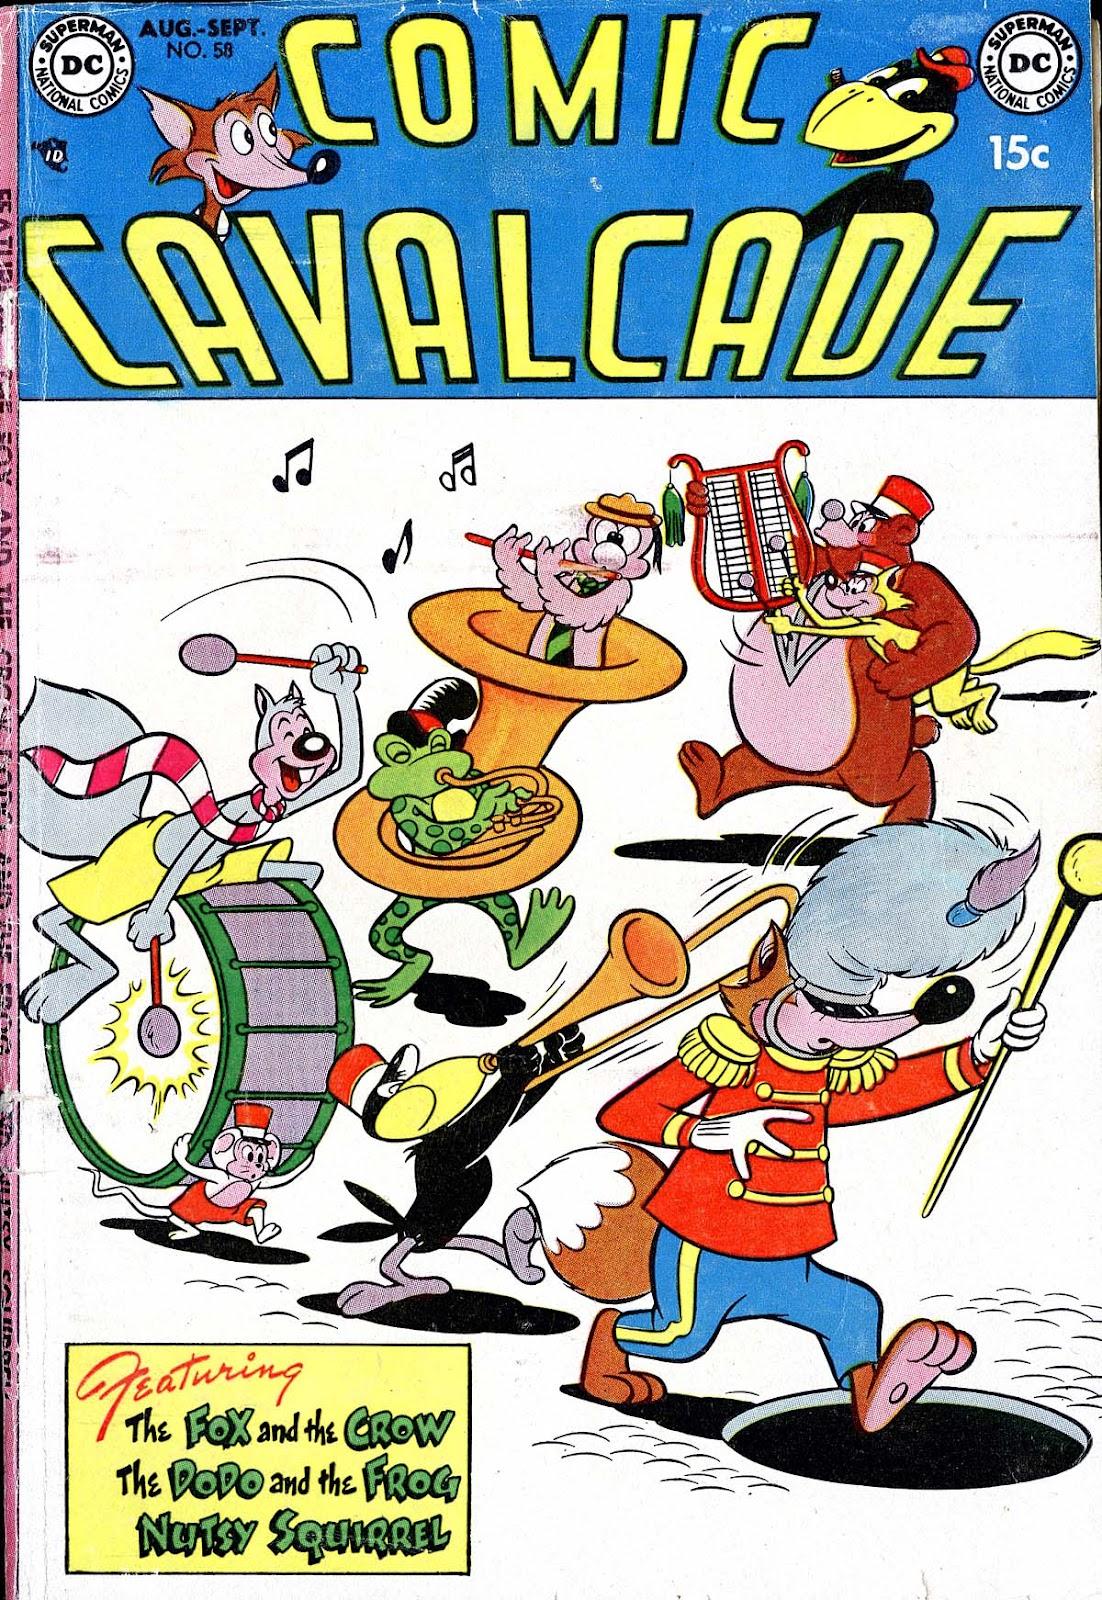 Comic Cavalcade issue 58 - Page 1